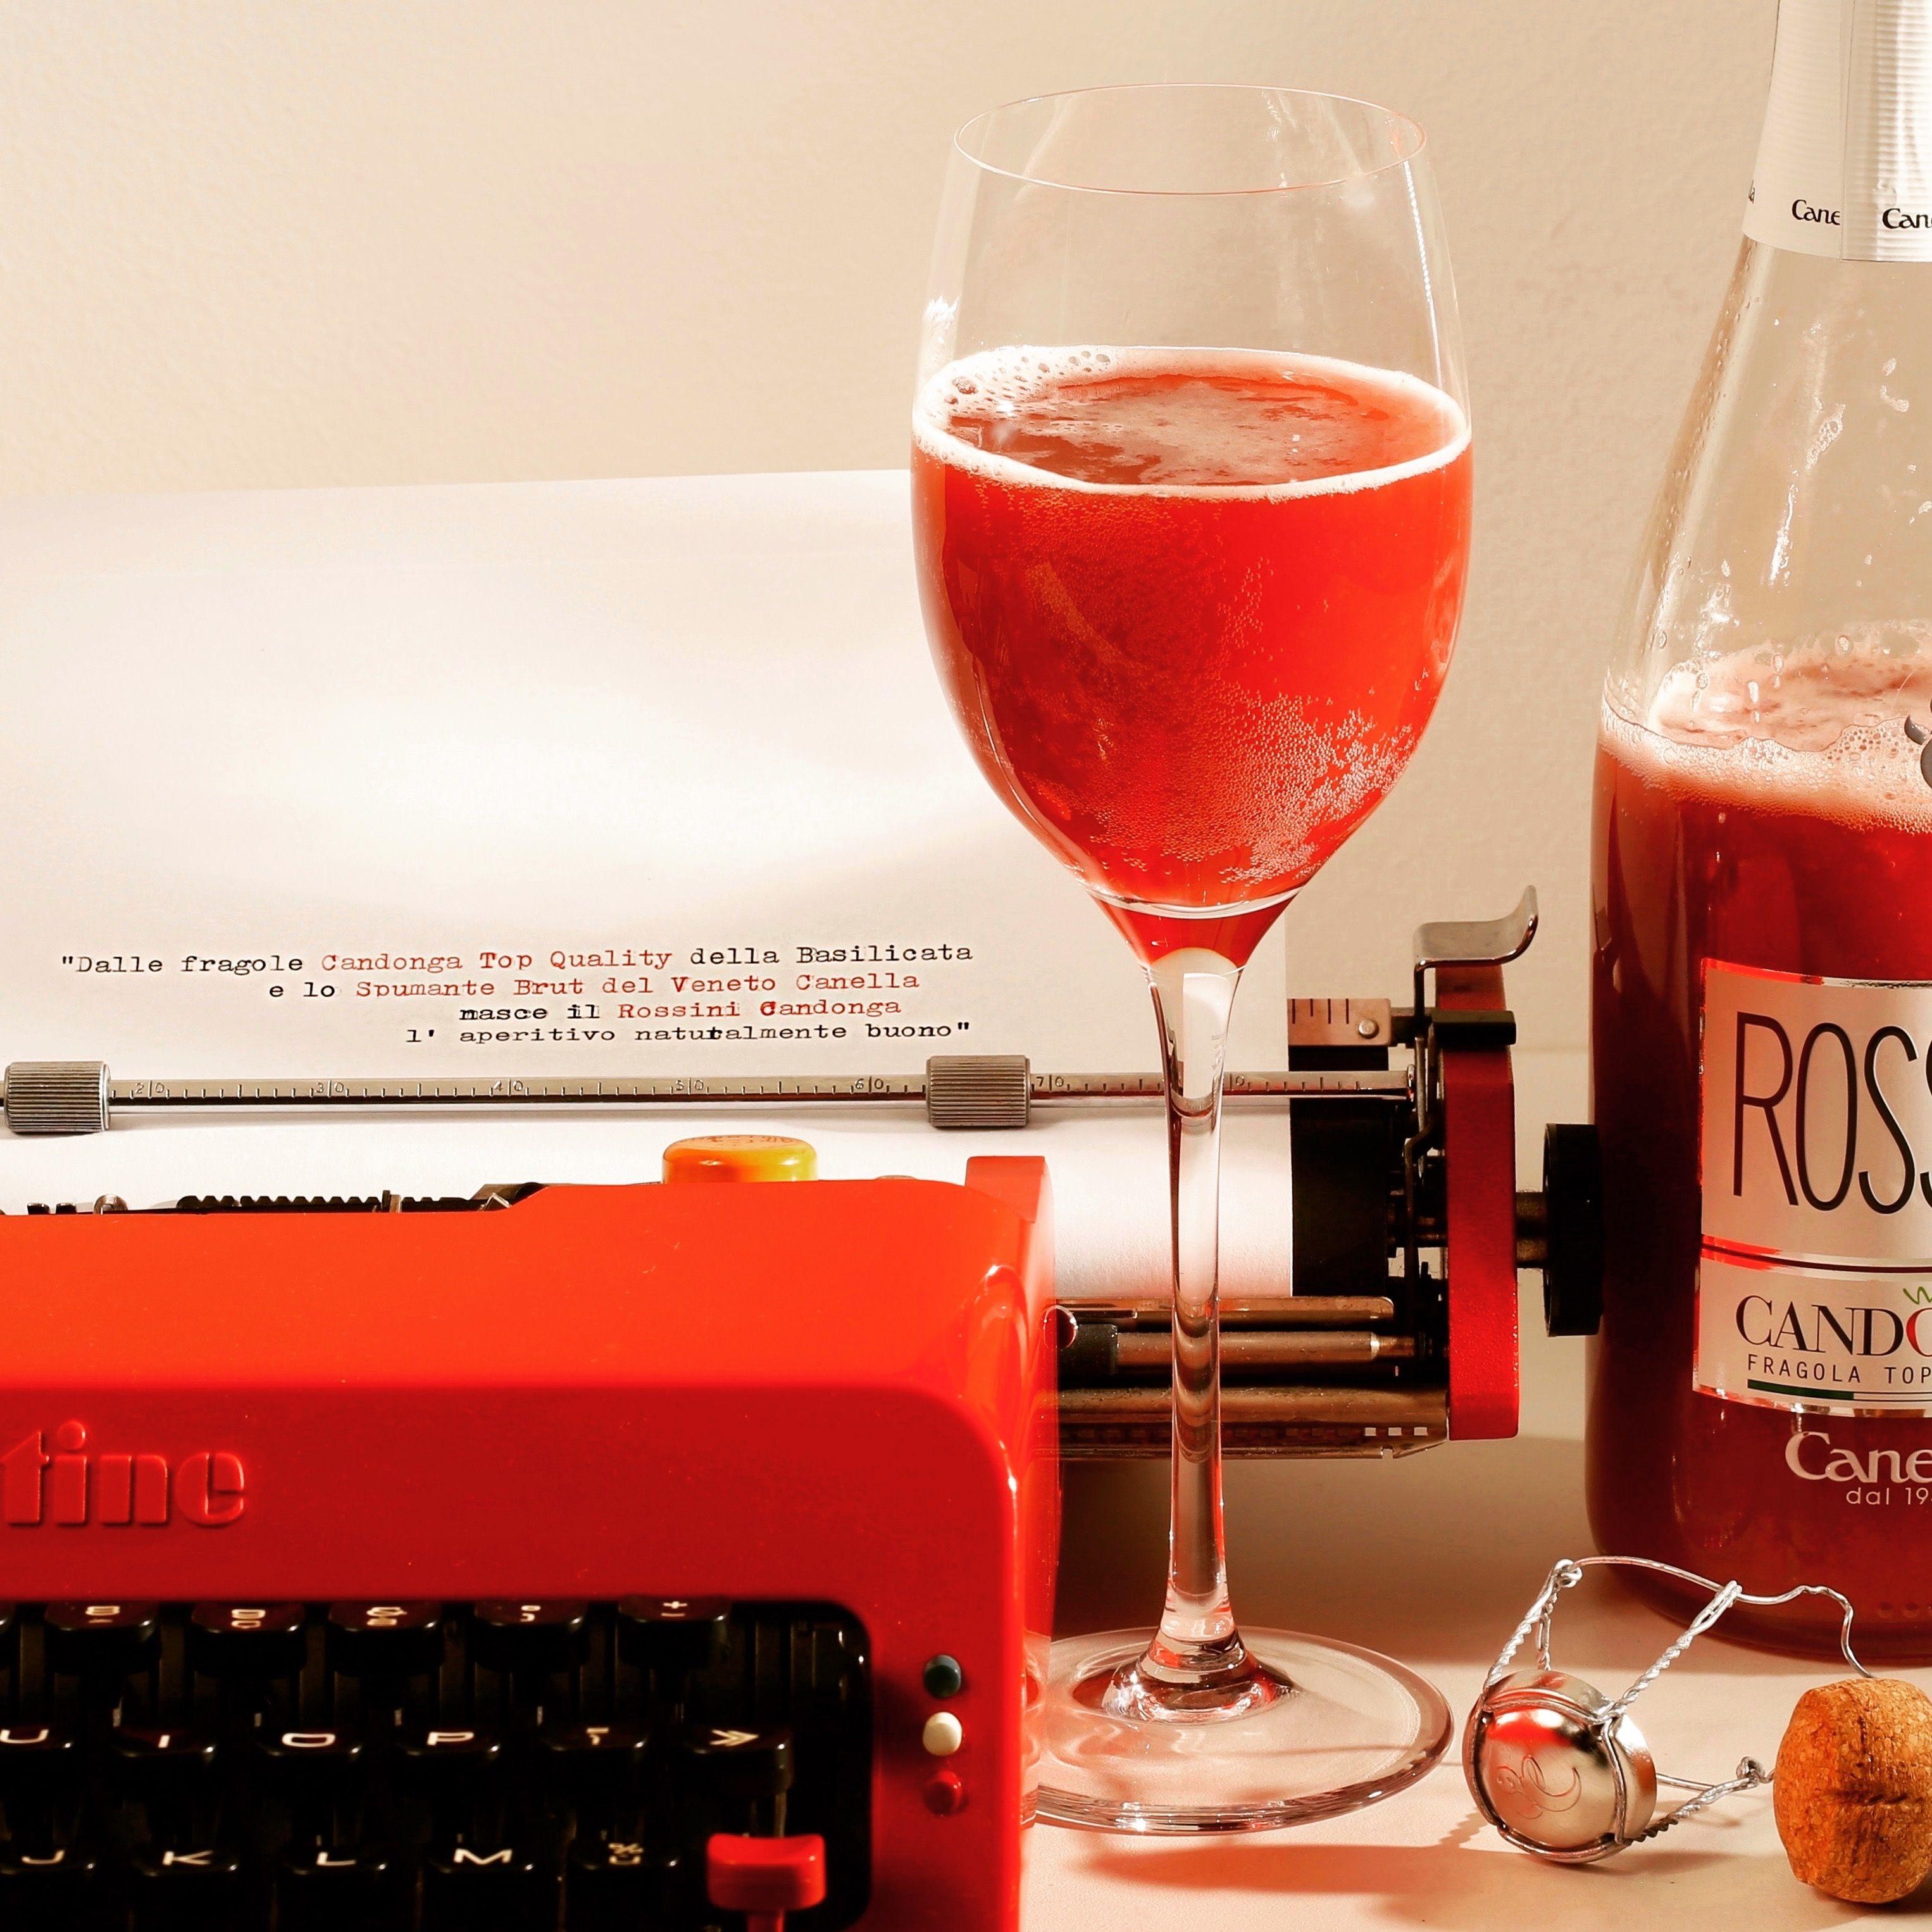 rossini 起泡酒 rossini Canella 低卡无添加 草莓酒丨意大利